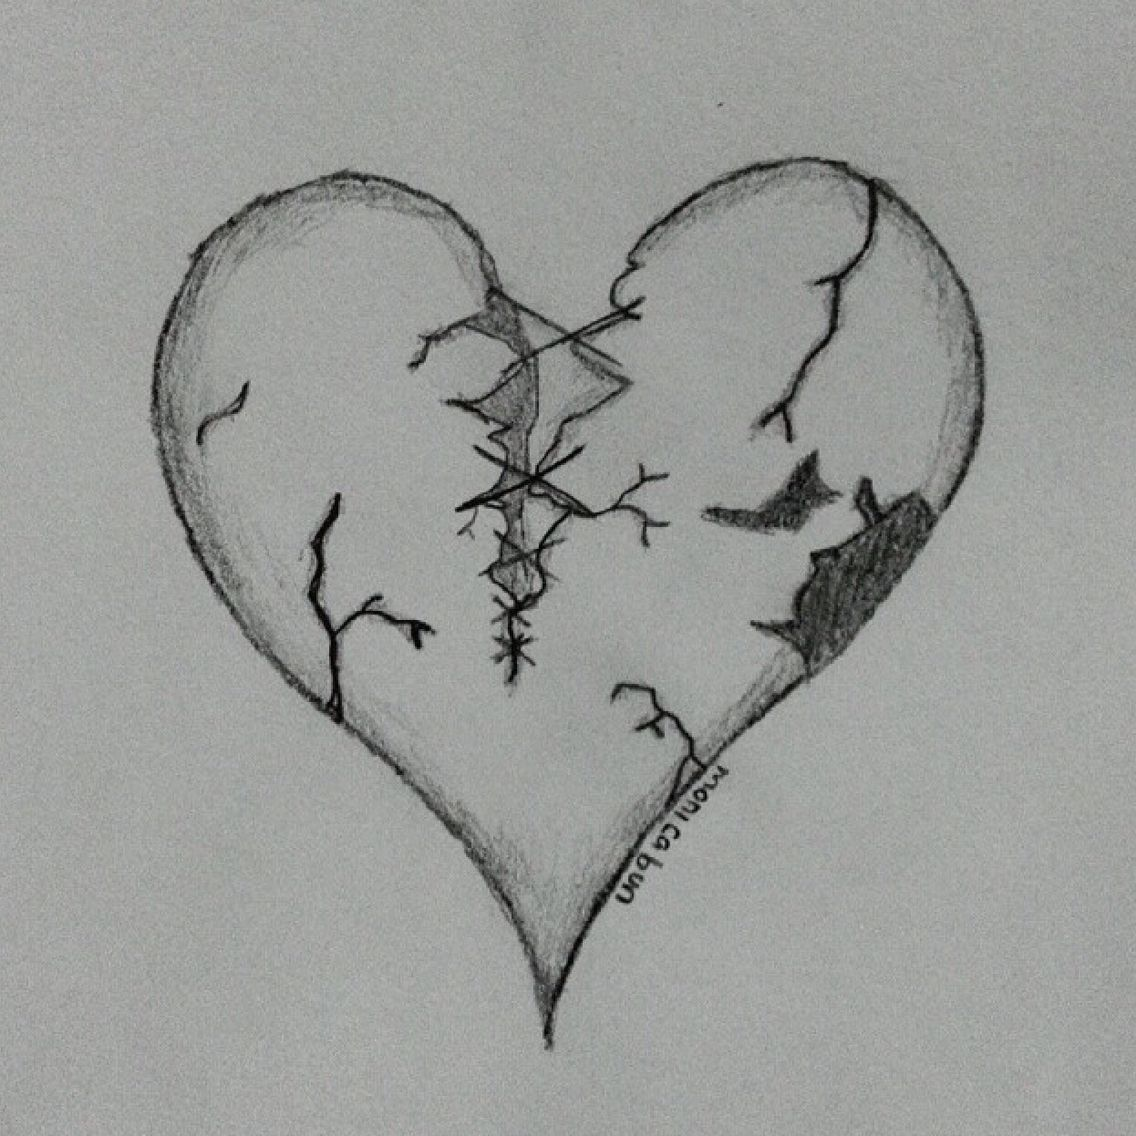 Just A Broken Hearted #art #sketch #black #color #draw